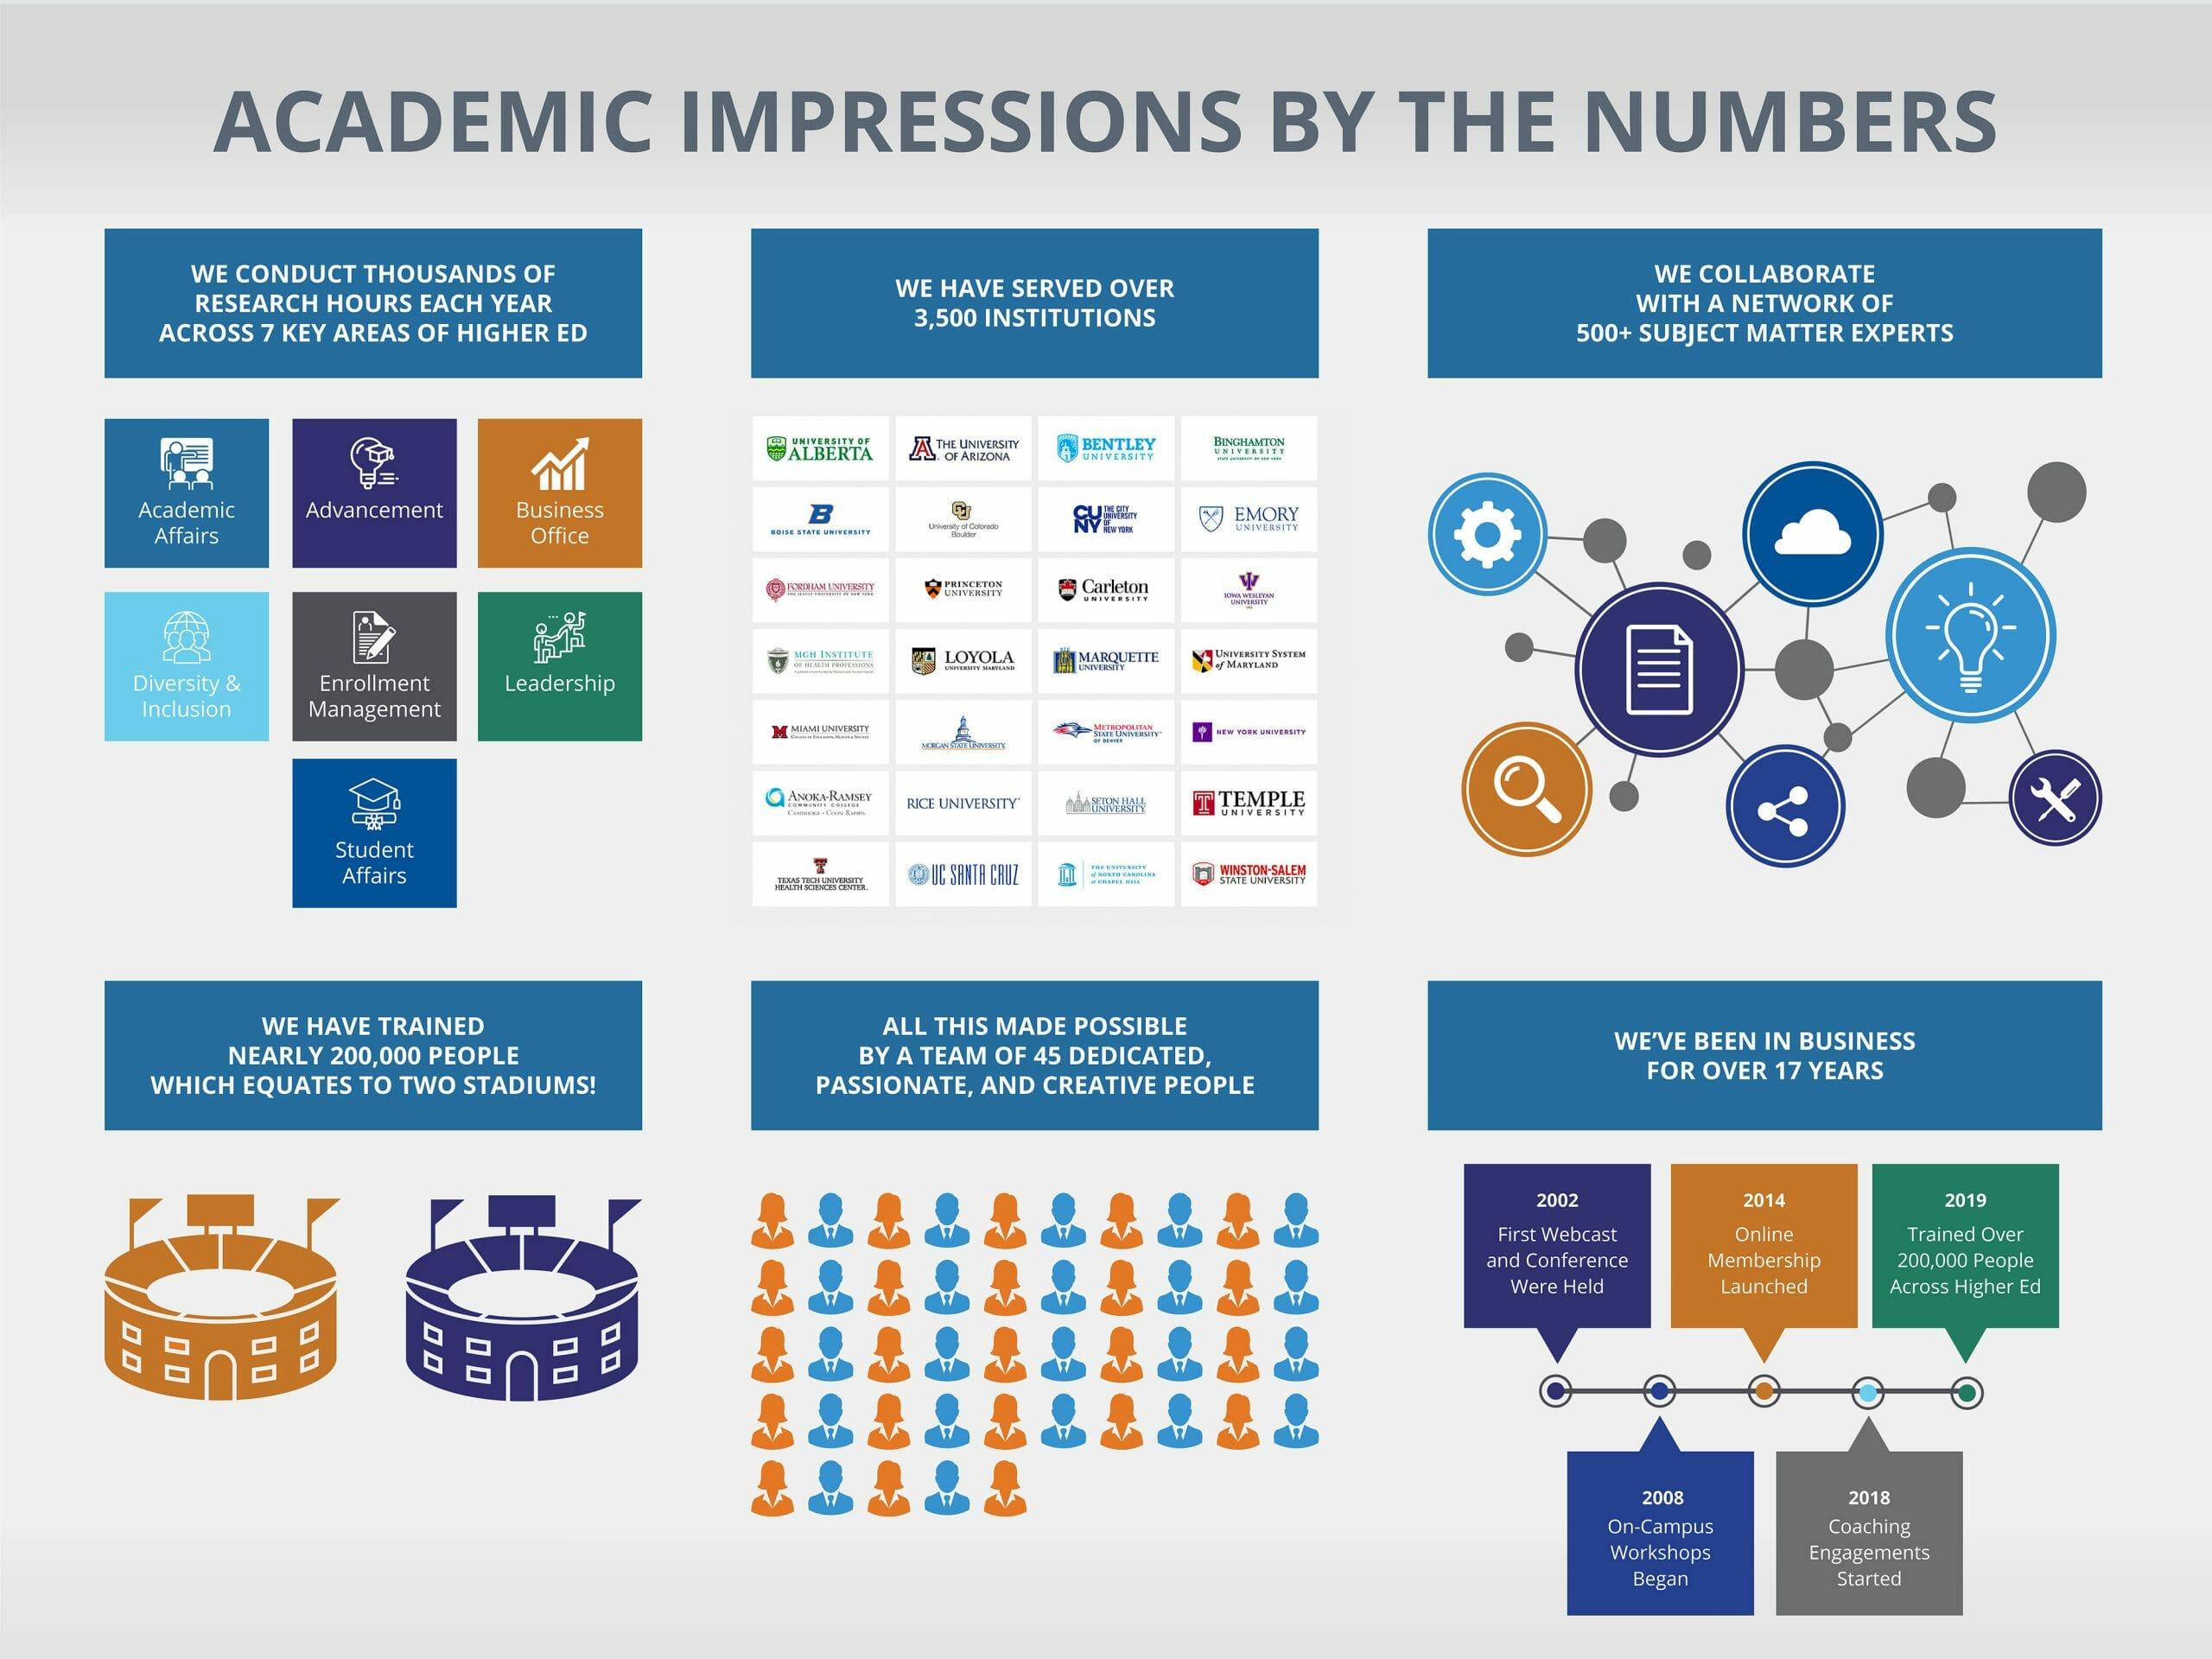 Infographic providing highlights of Academic Impressions milestones